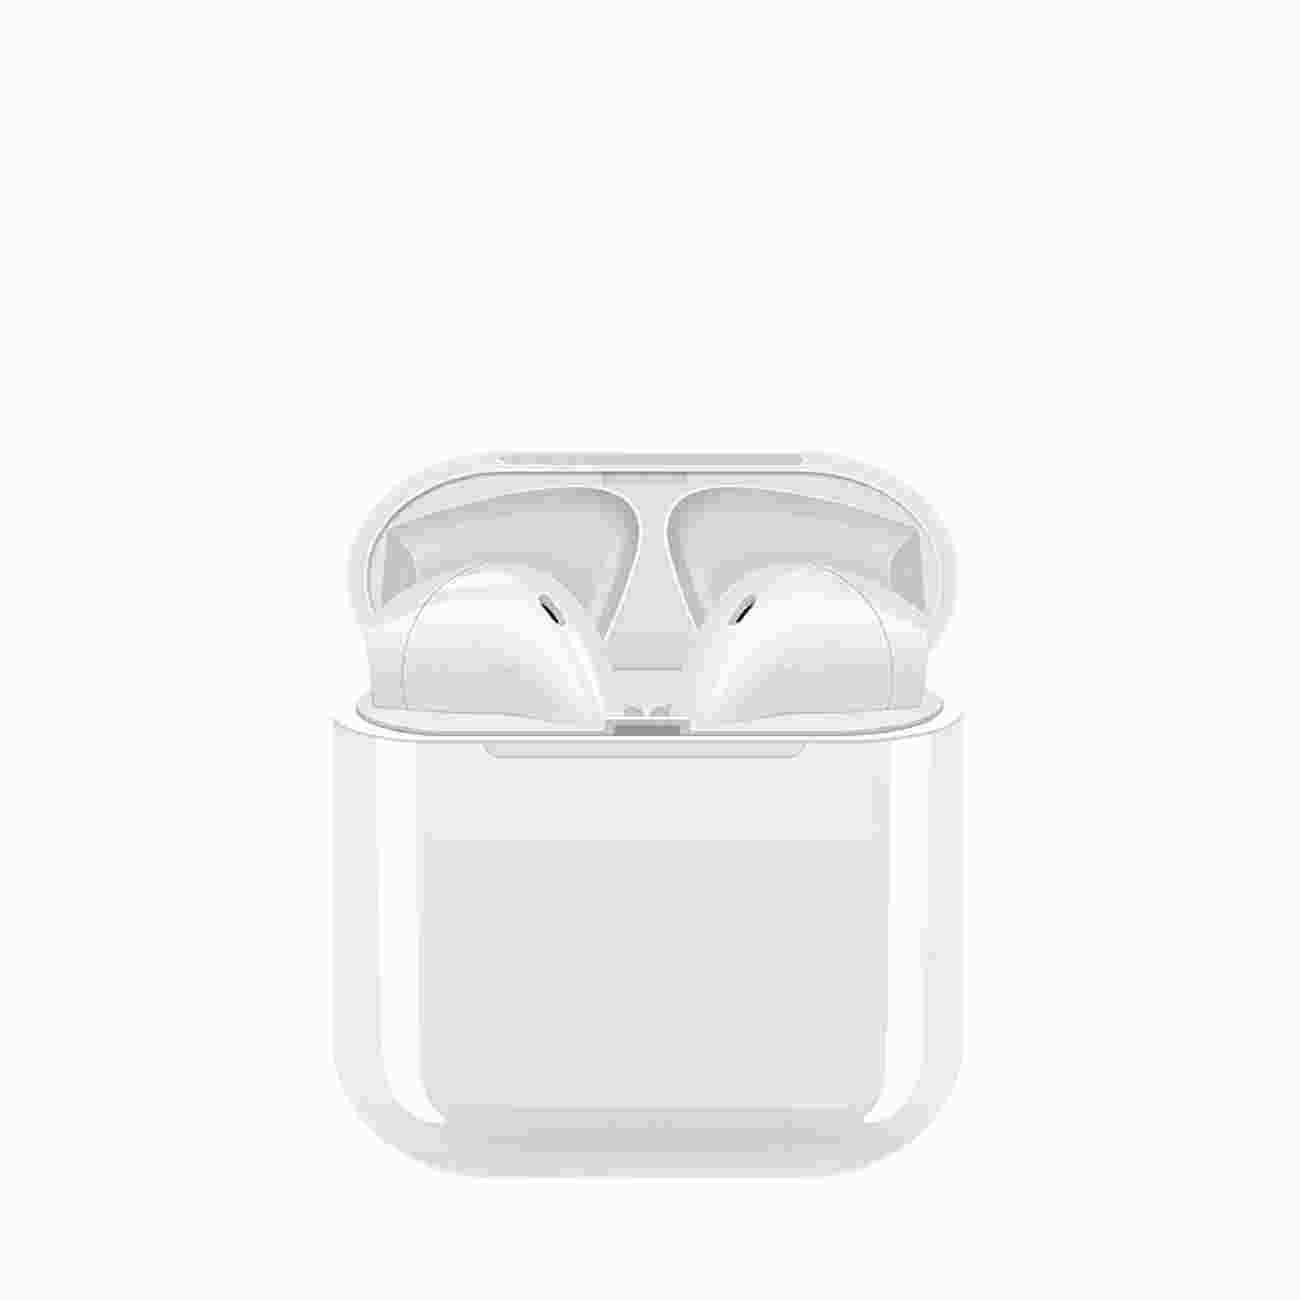 tws蓝牙耳机加工 tws蓝牙耳机厂家 苹果tws蓝牙耳机厂家